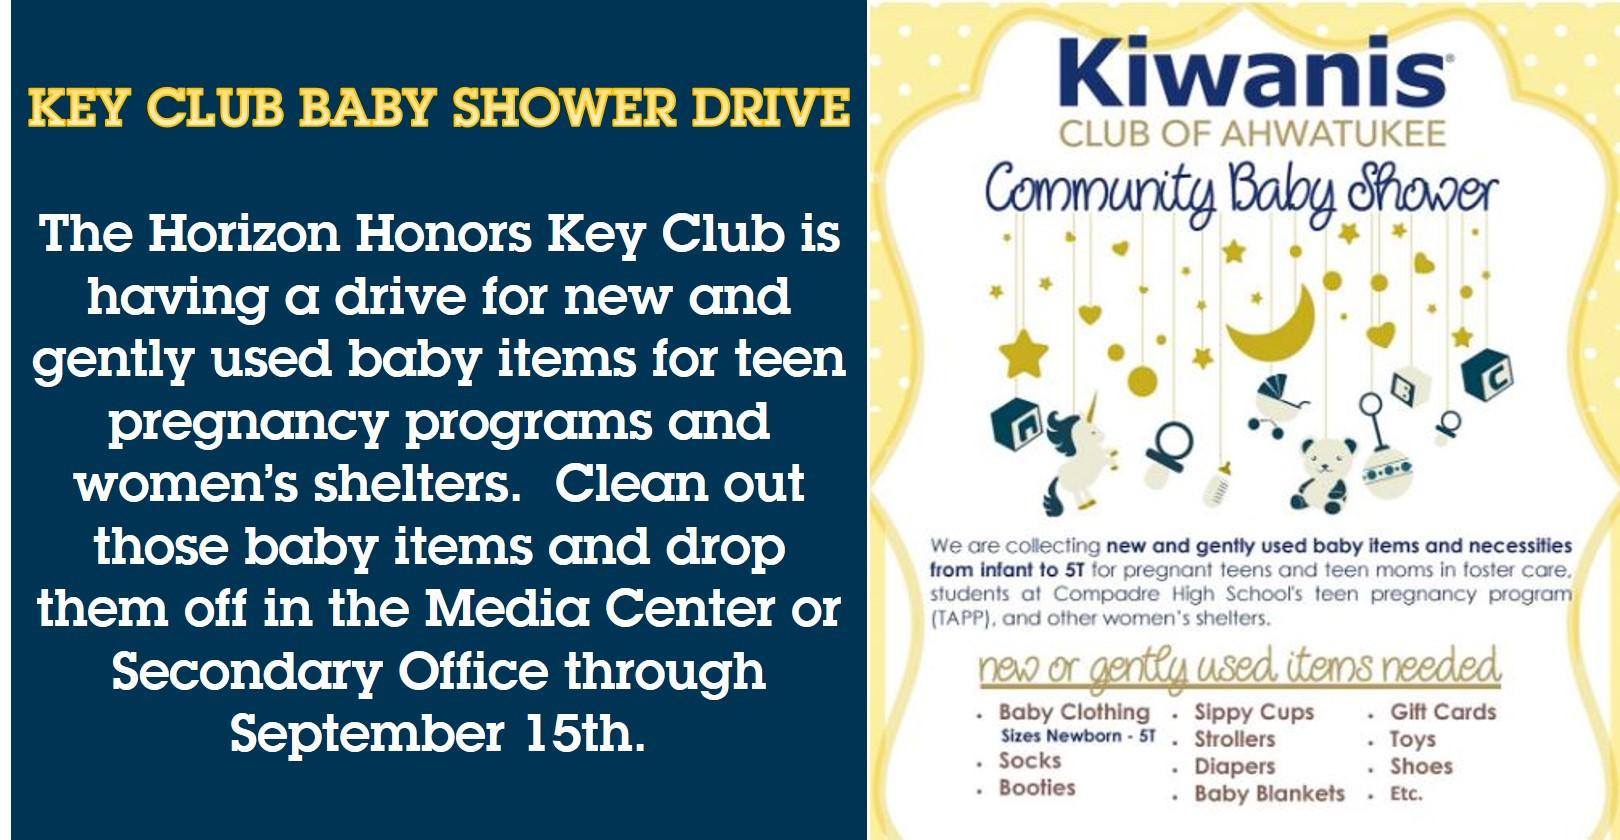 hs-key-club-baby-shower-drive.jpg